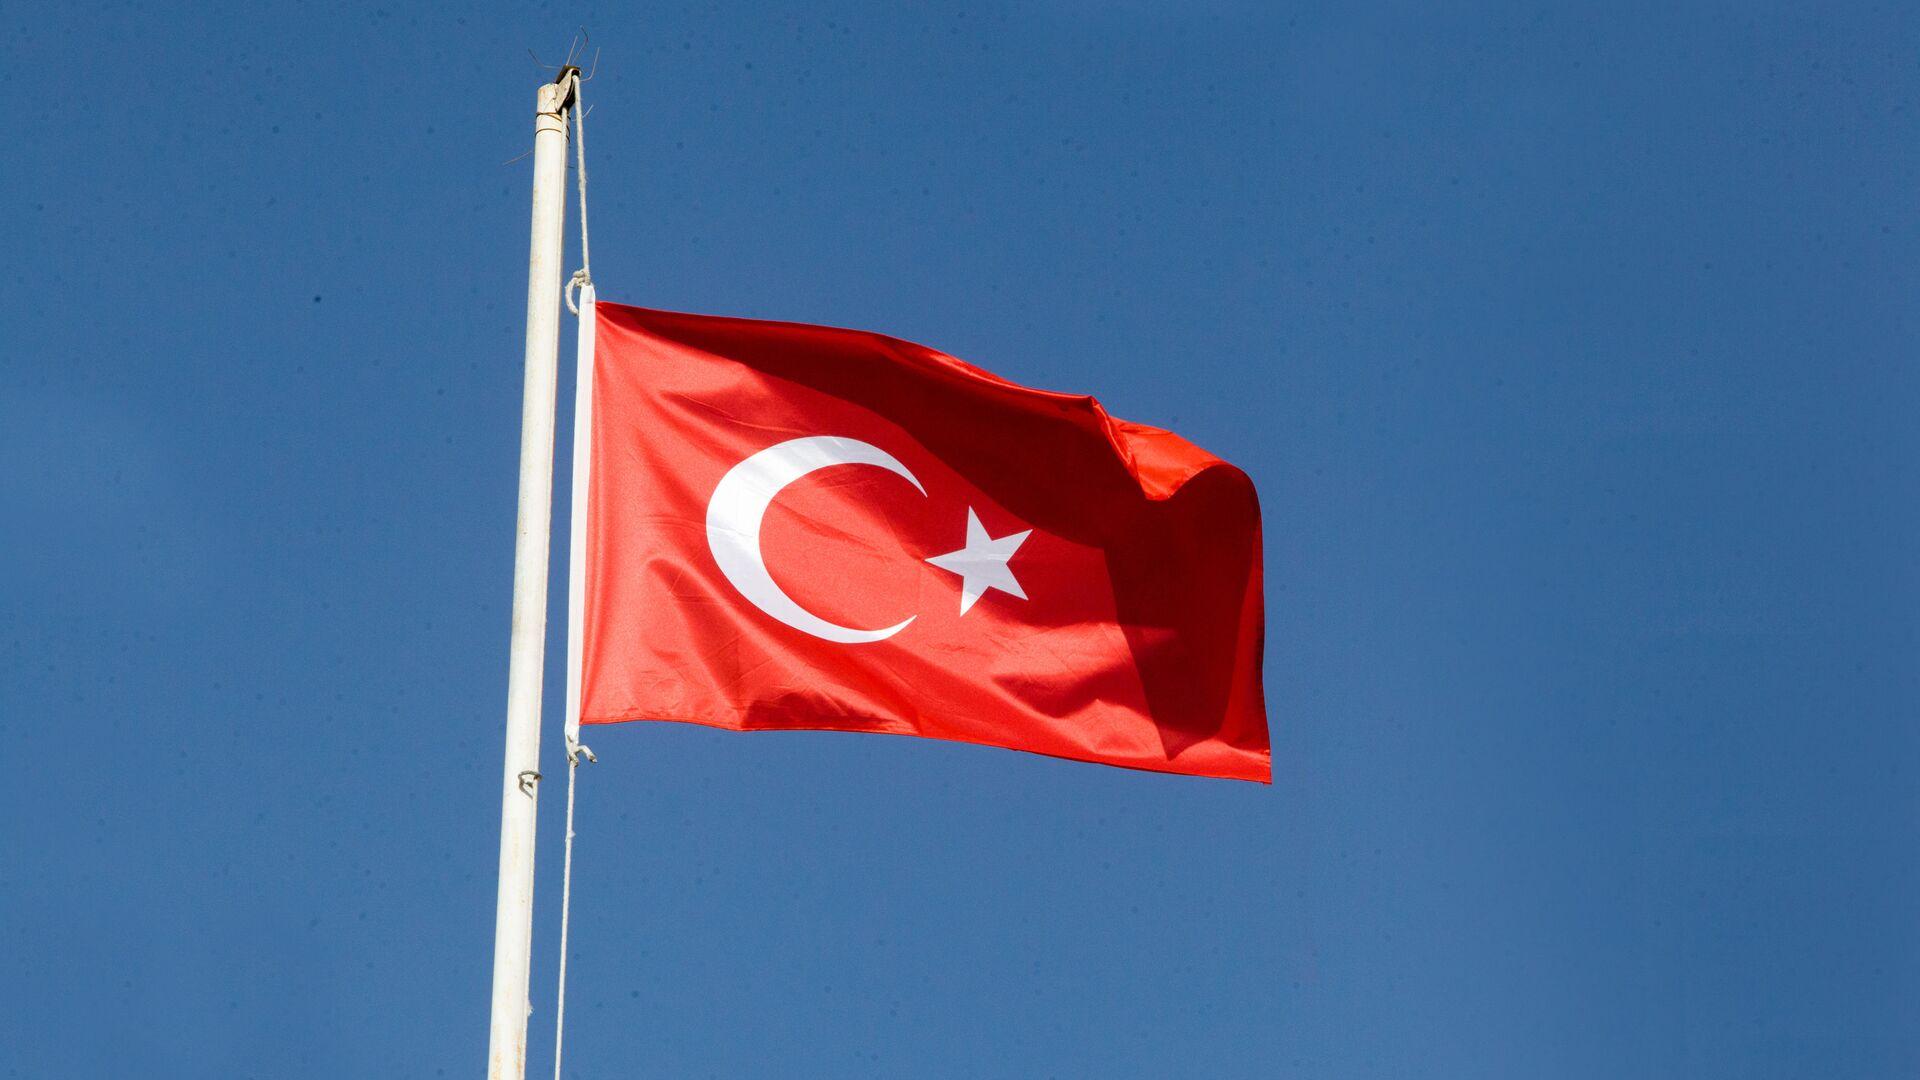 Флаг Турции, фото из архива - Sputnik Azərbaycan, 1920, 29.08.2021